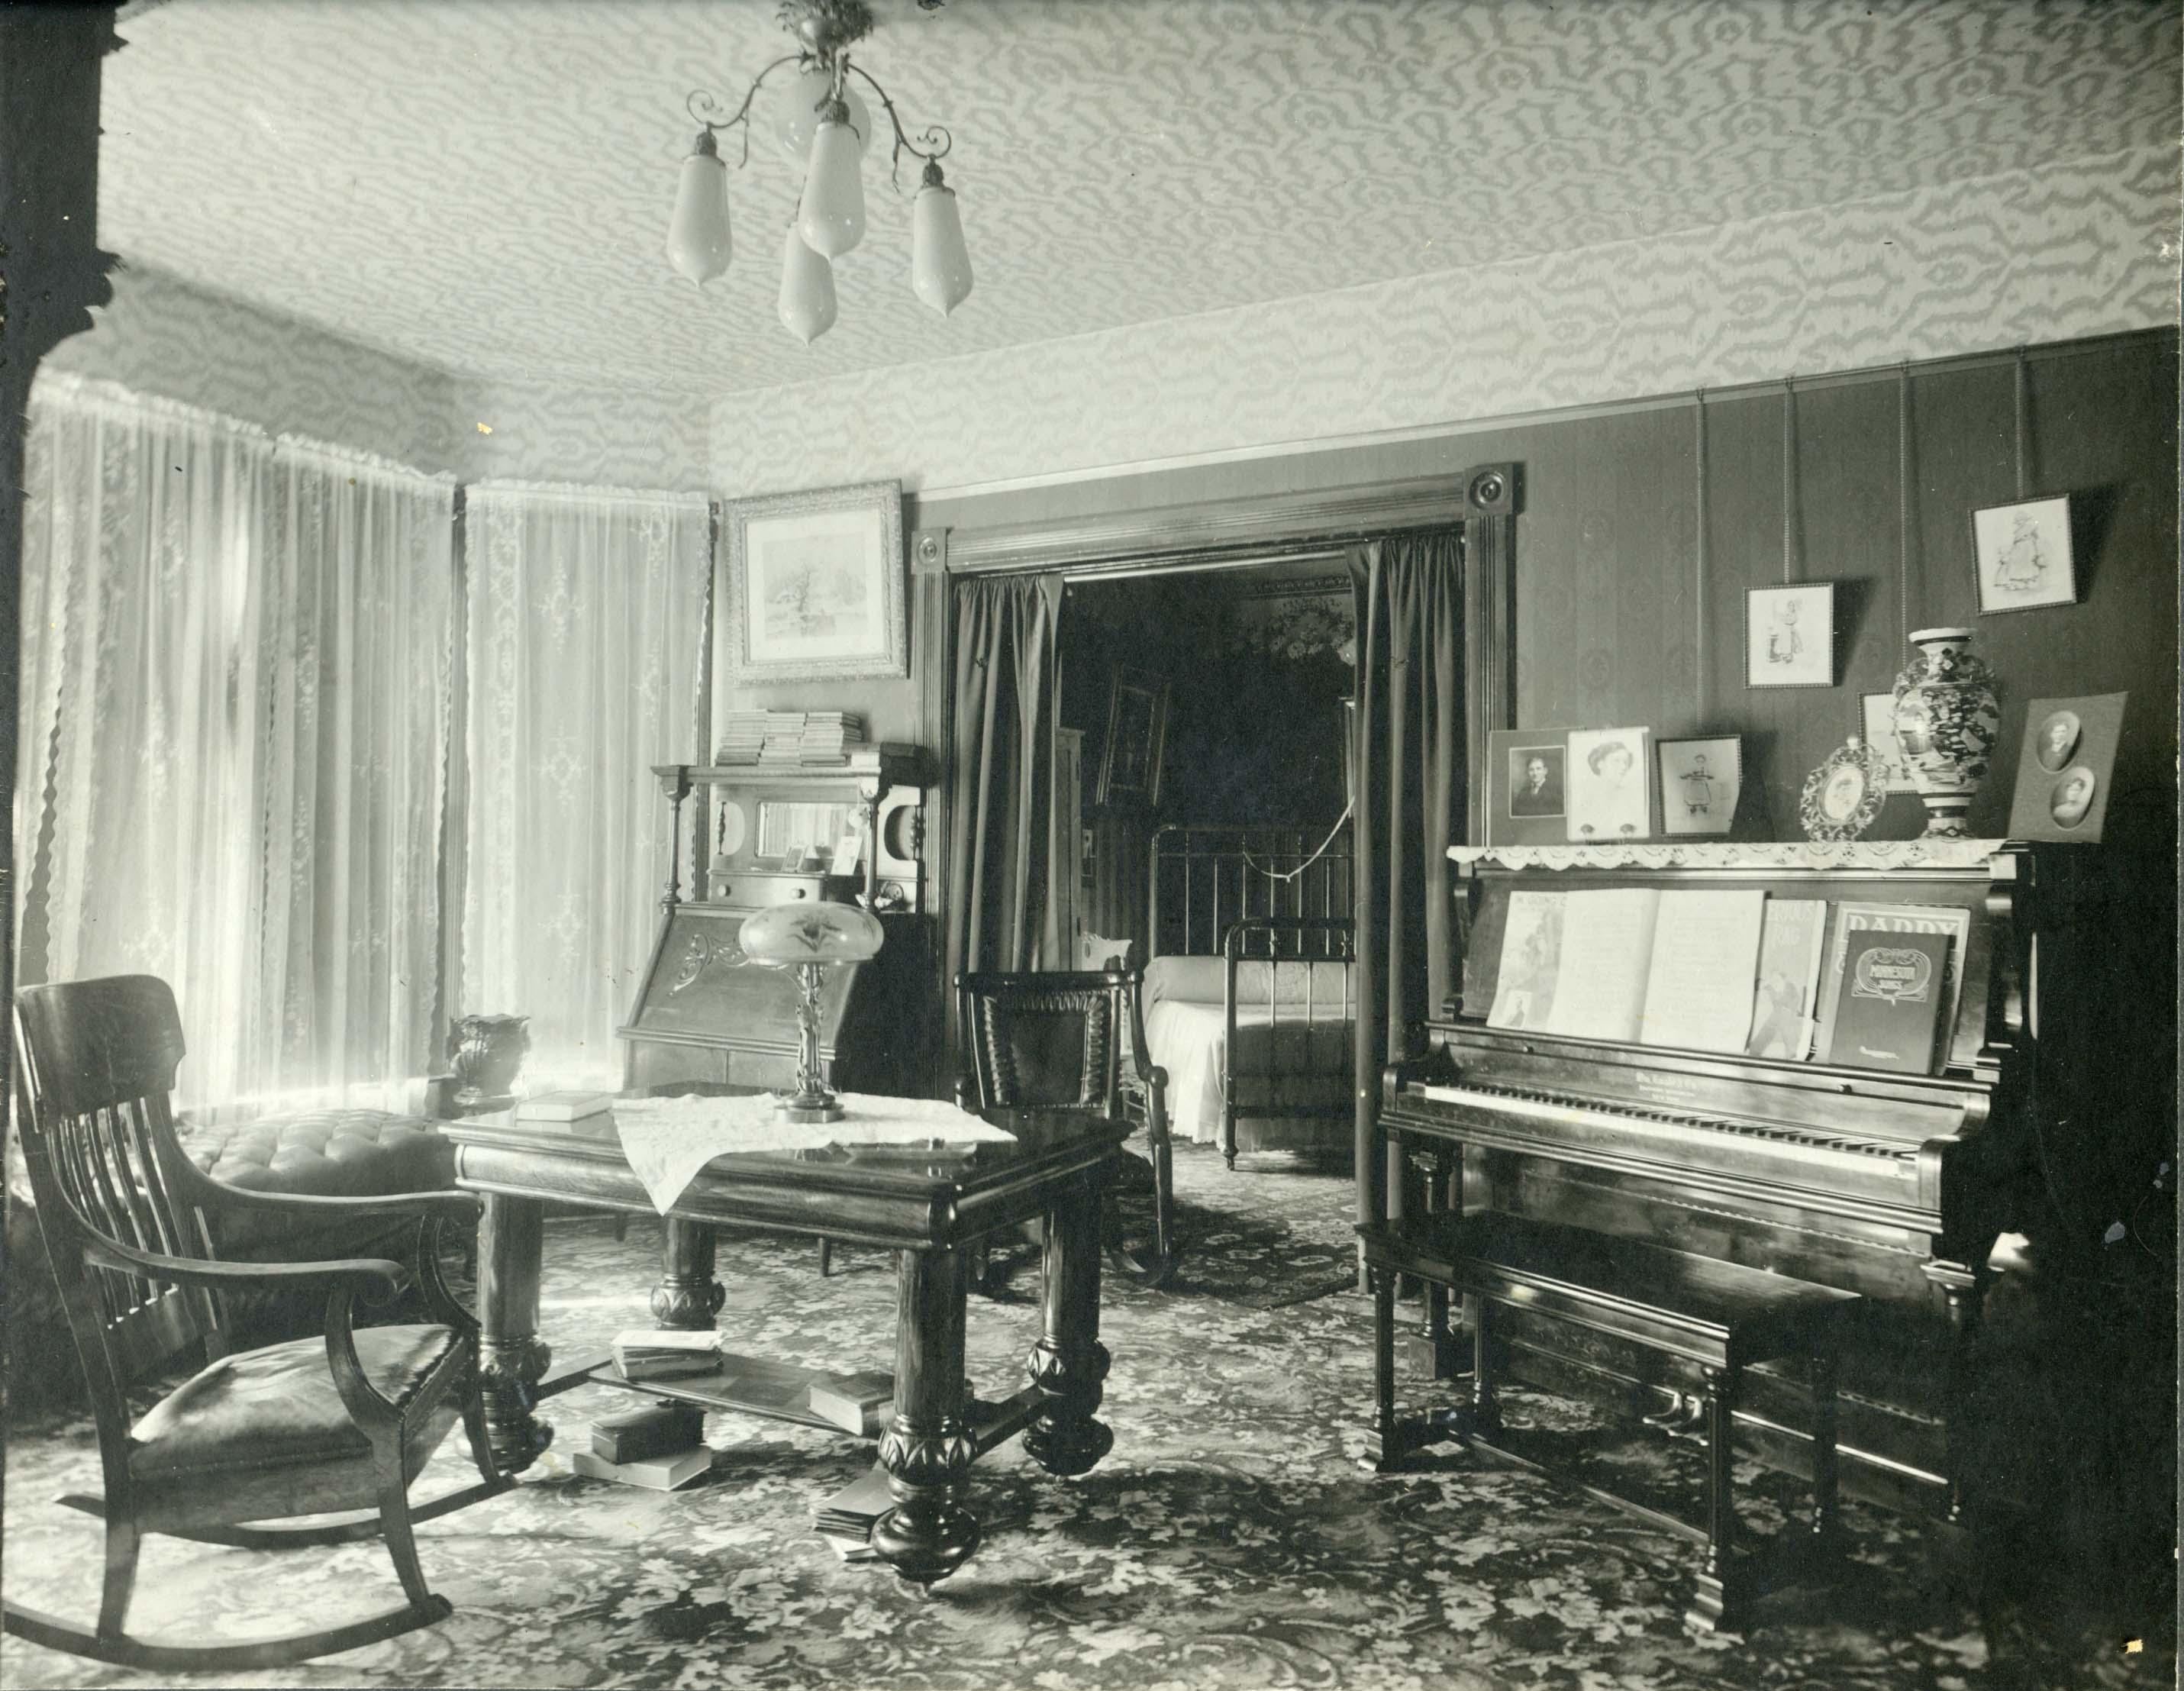 Early Twentieth Century Home Decor